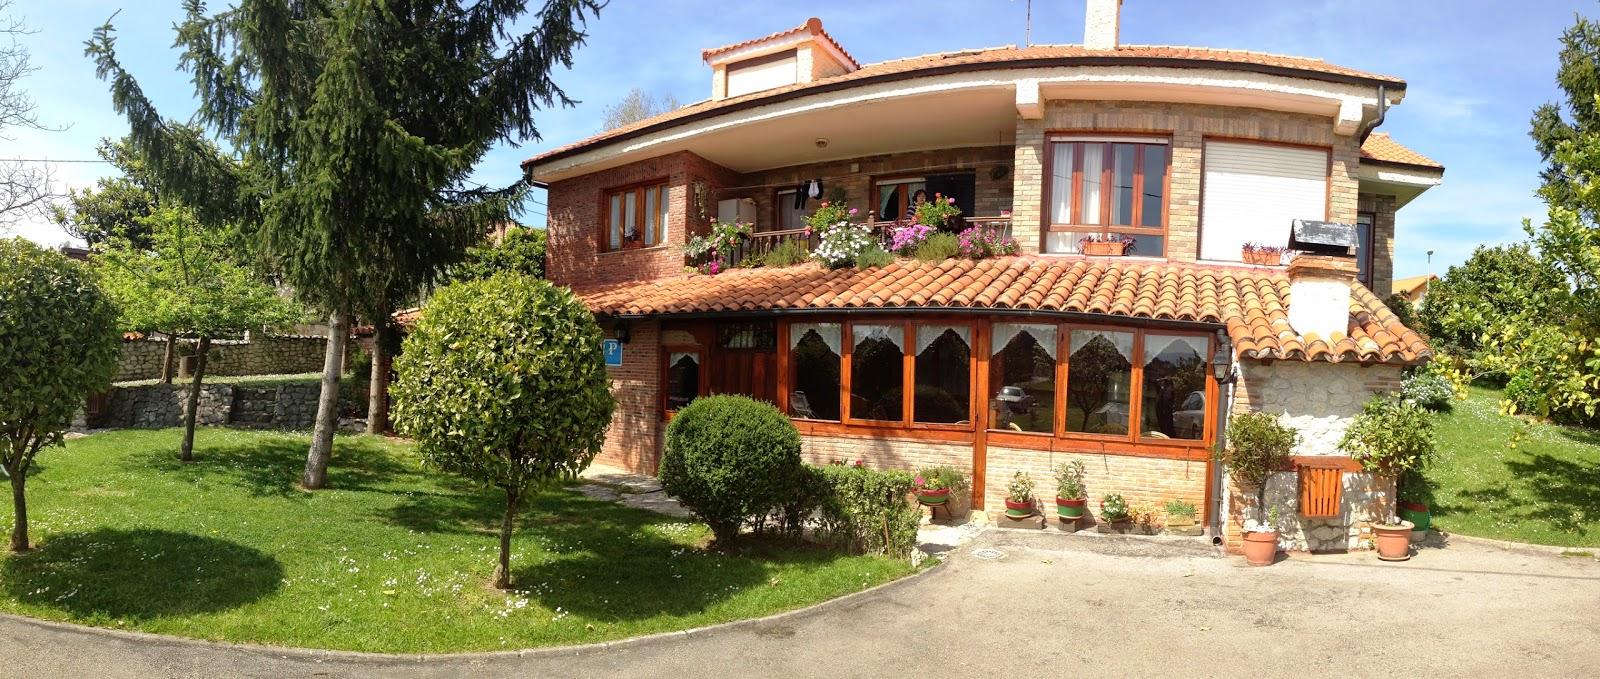 Casa rural con piscina en santillana del mar panor micas for Casas rurales cerca de piscinas naturales